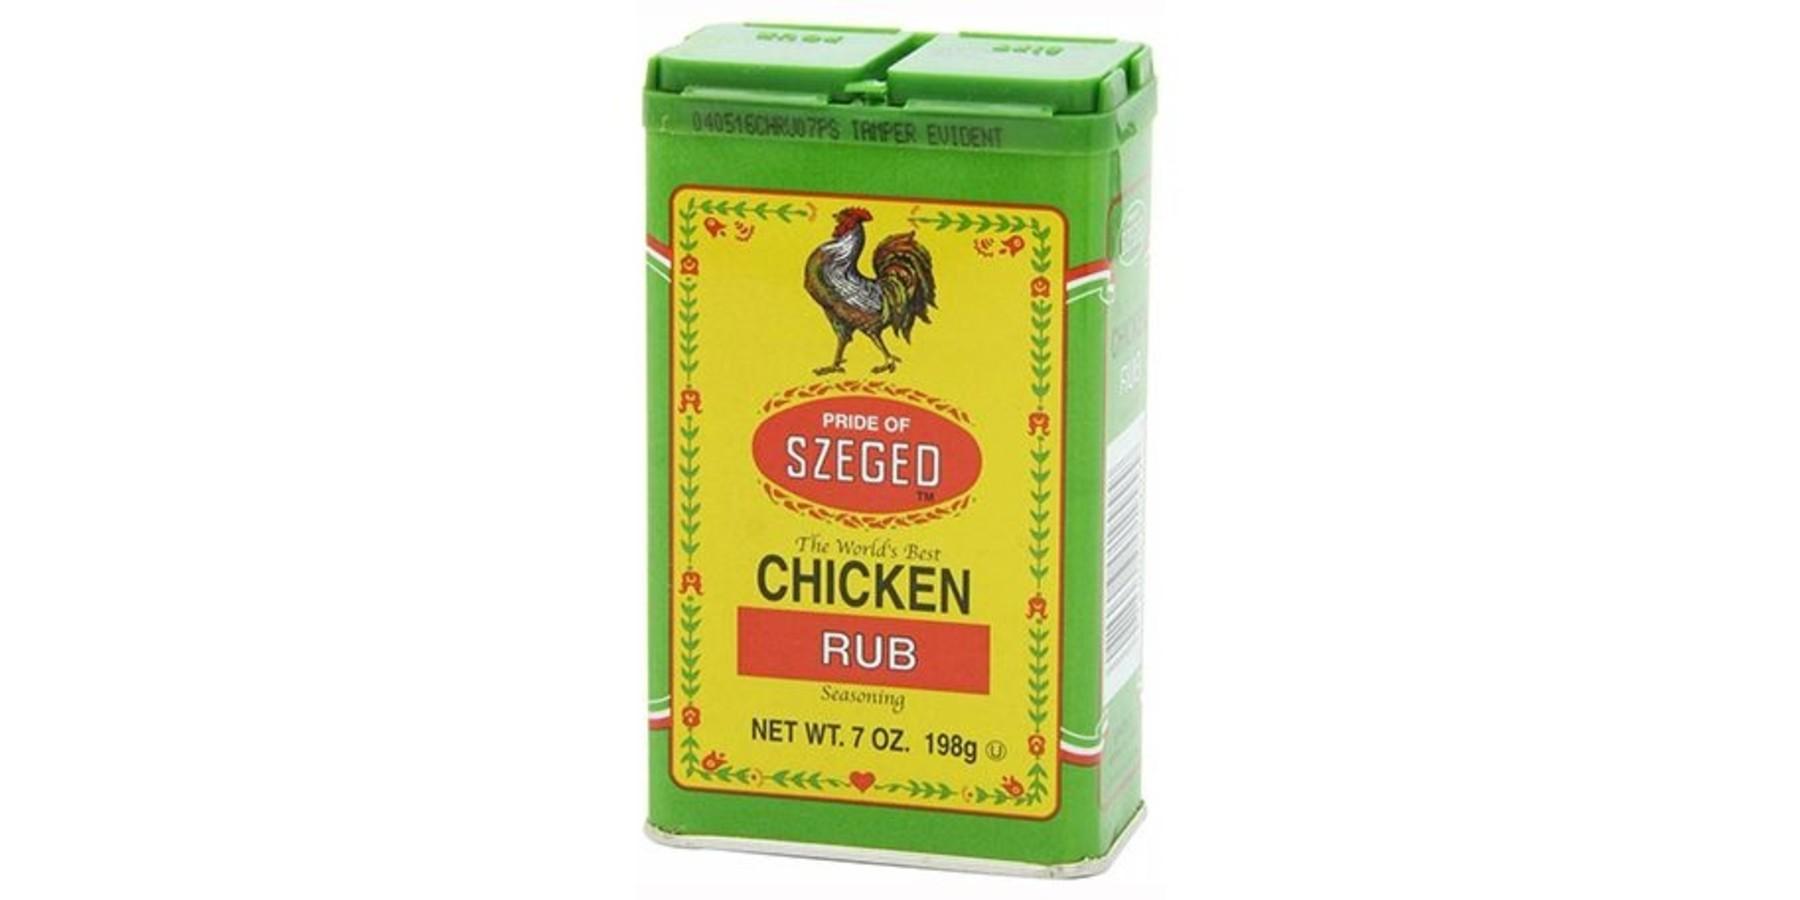 Chicken szeged rub